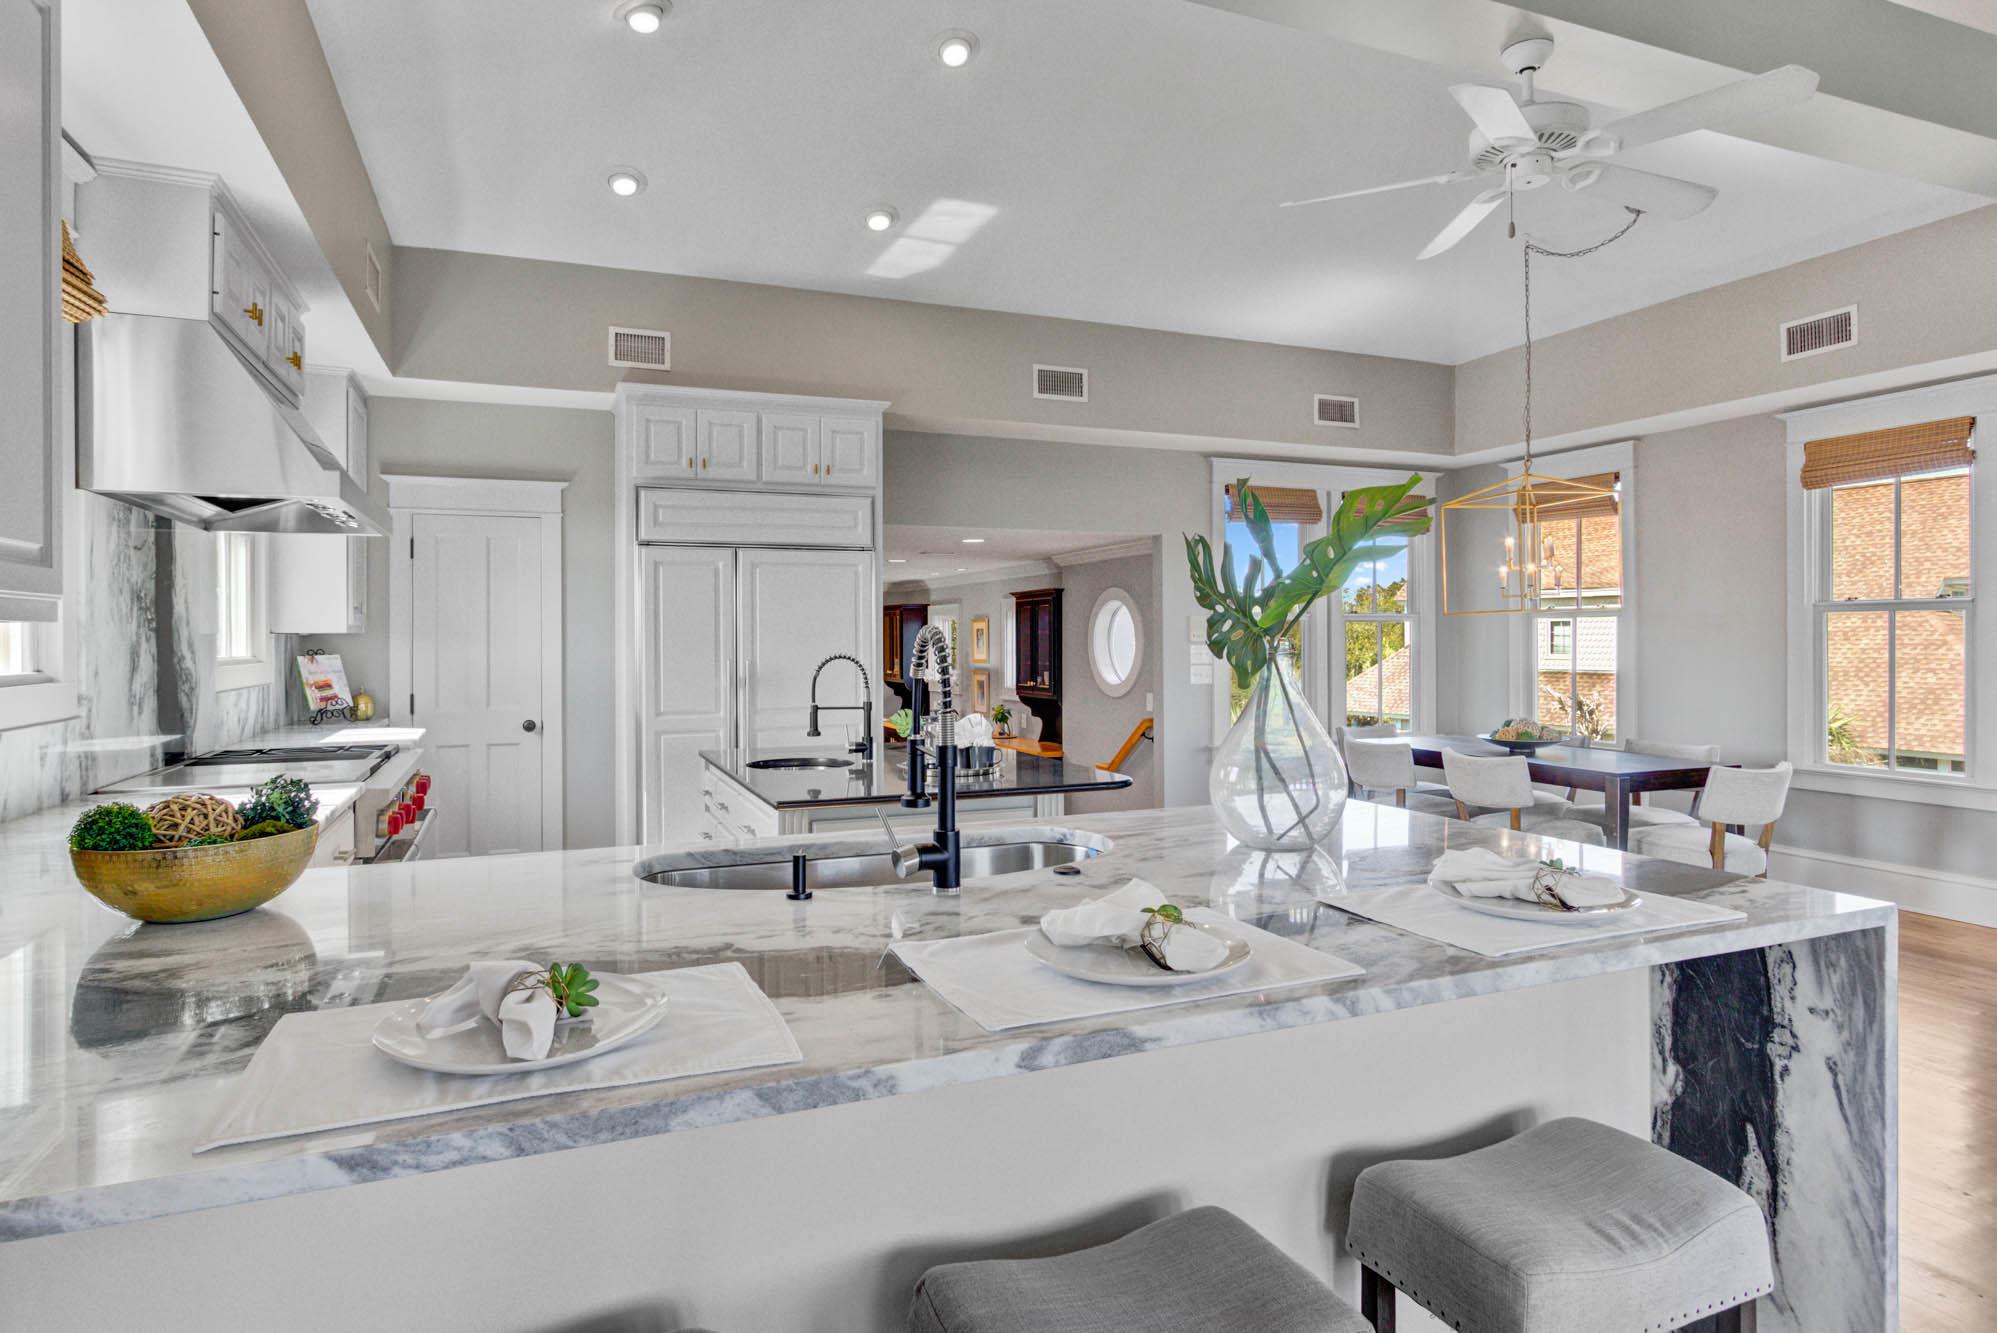 Sullivans Island Homes For Sale - 904 Middle, Sullivans Island, SC - 38